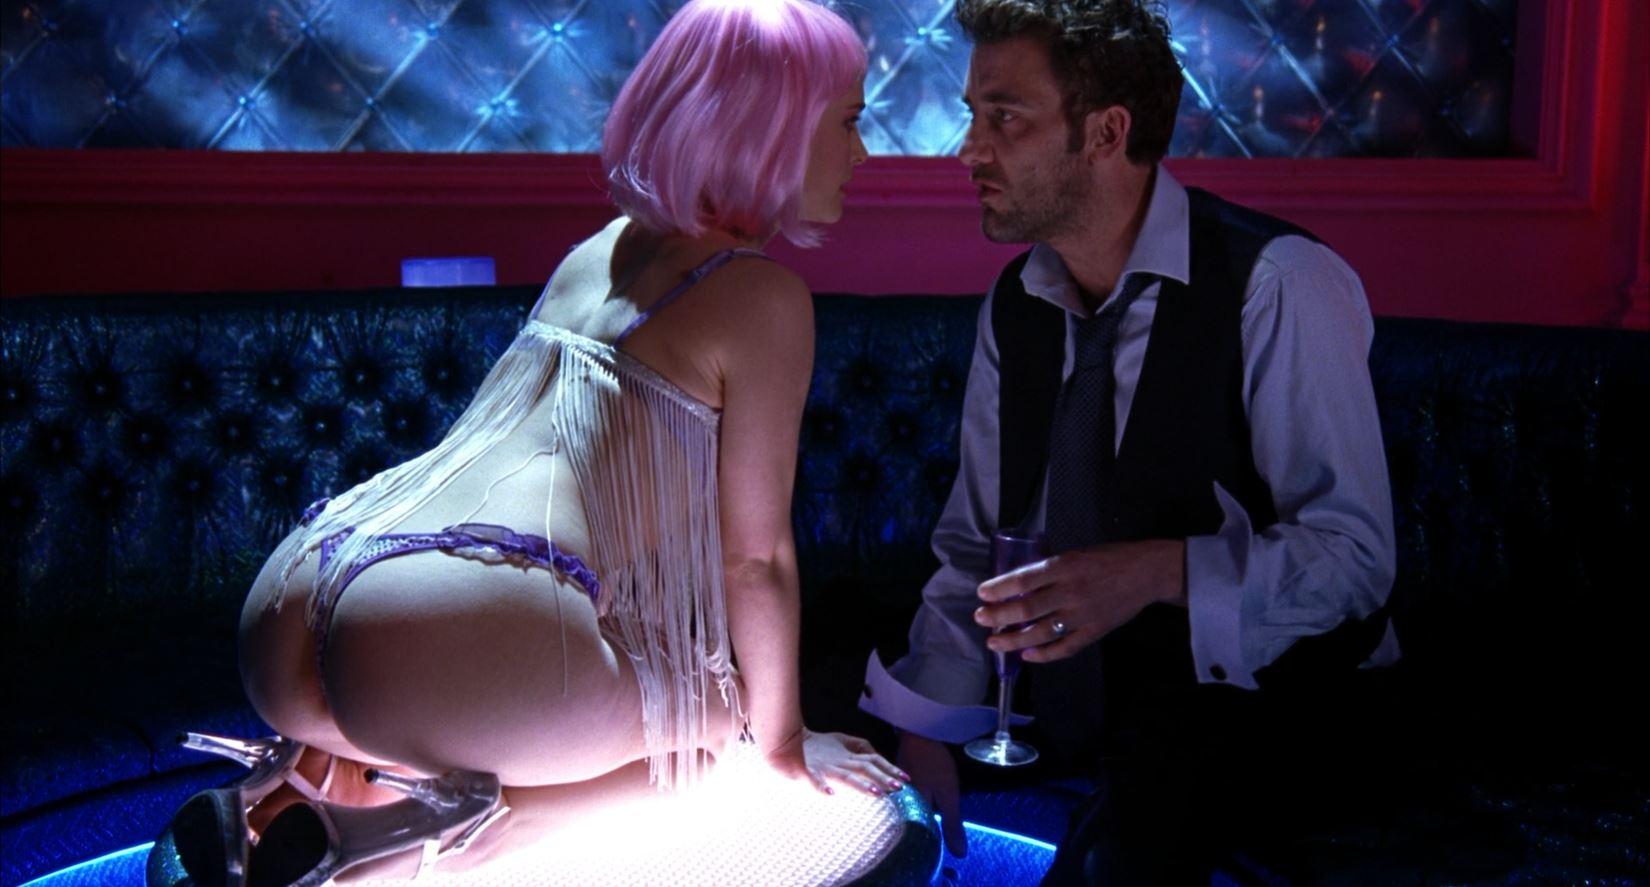 Closer - Natalie Portman in a thong 4